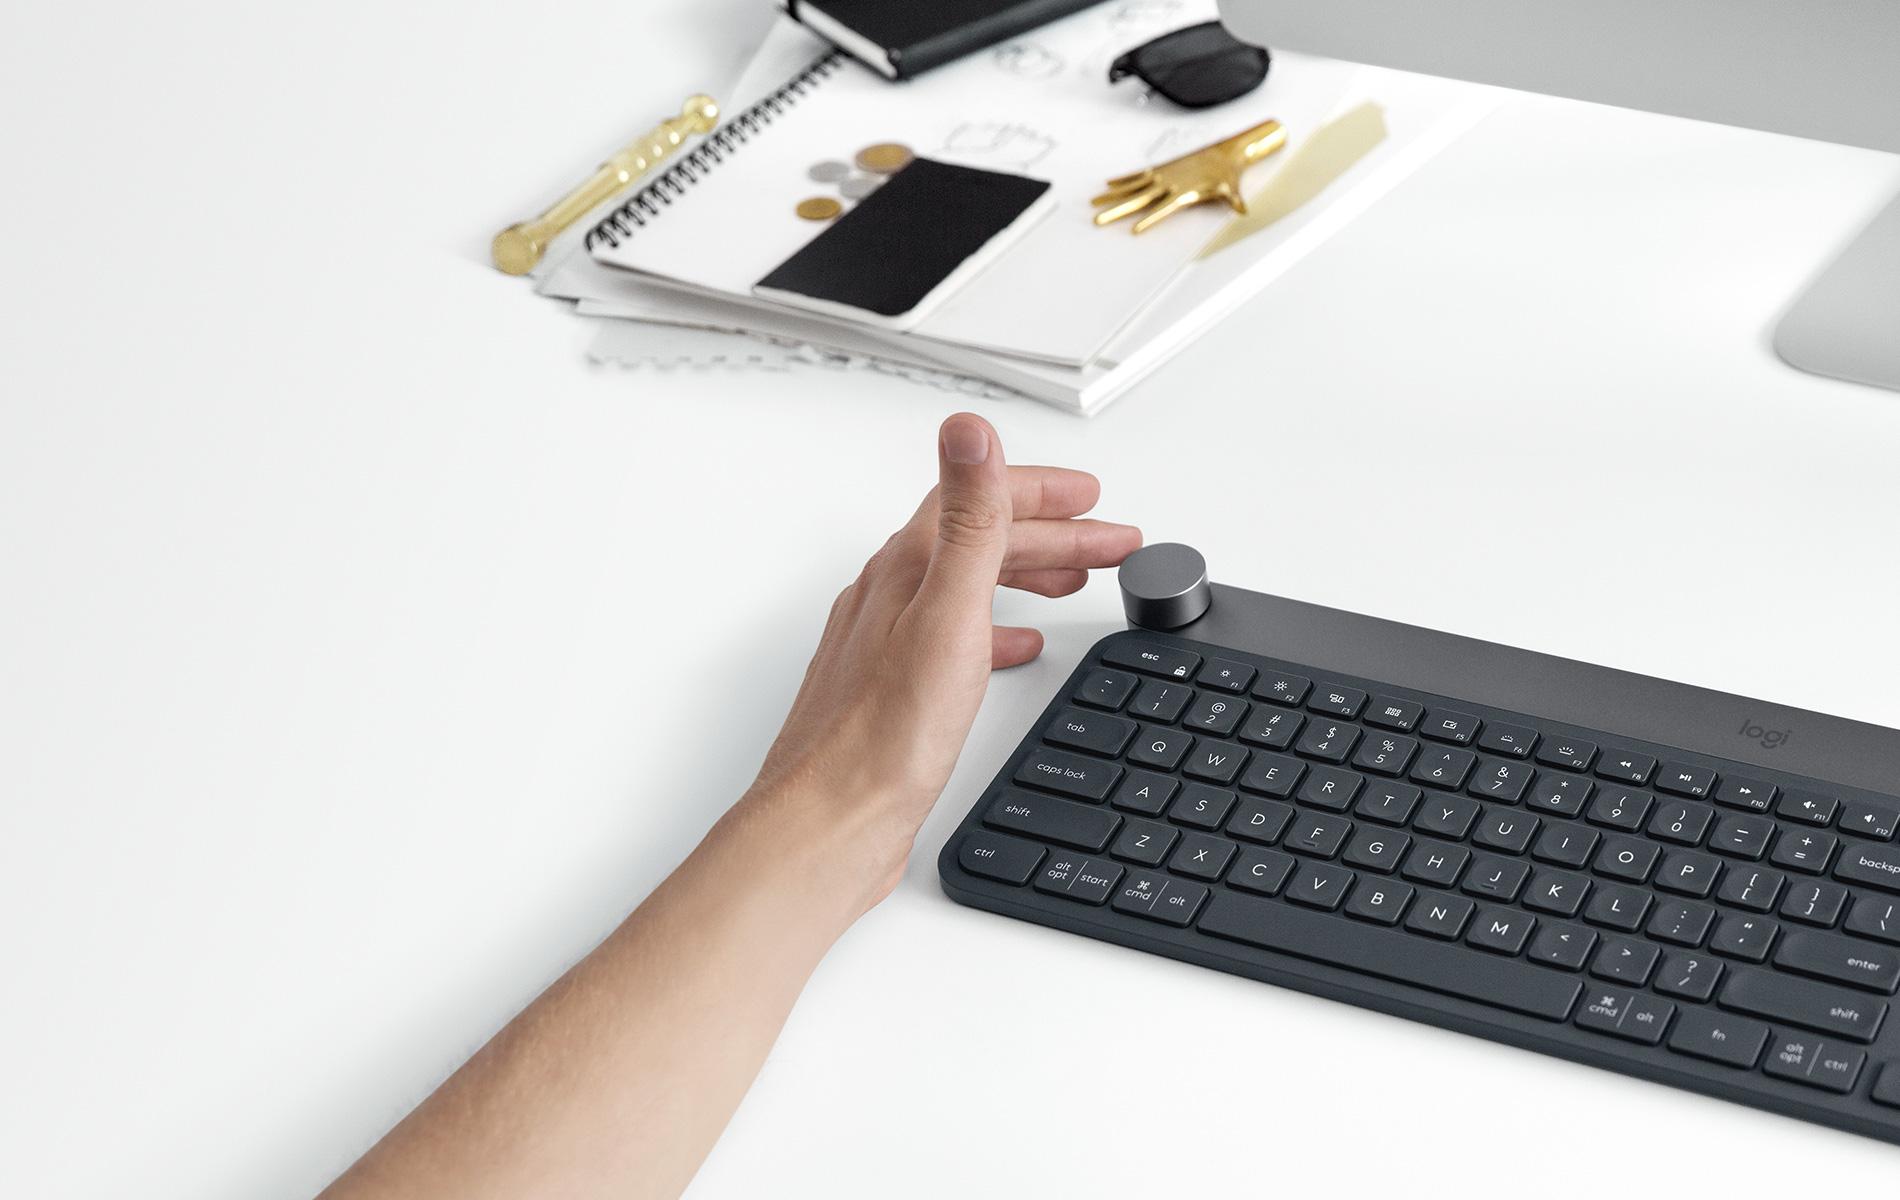 Logitech Craft Wireless Keyboard for Advanced Creativity Productivity